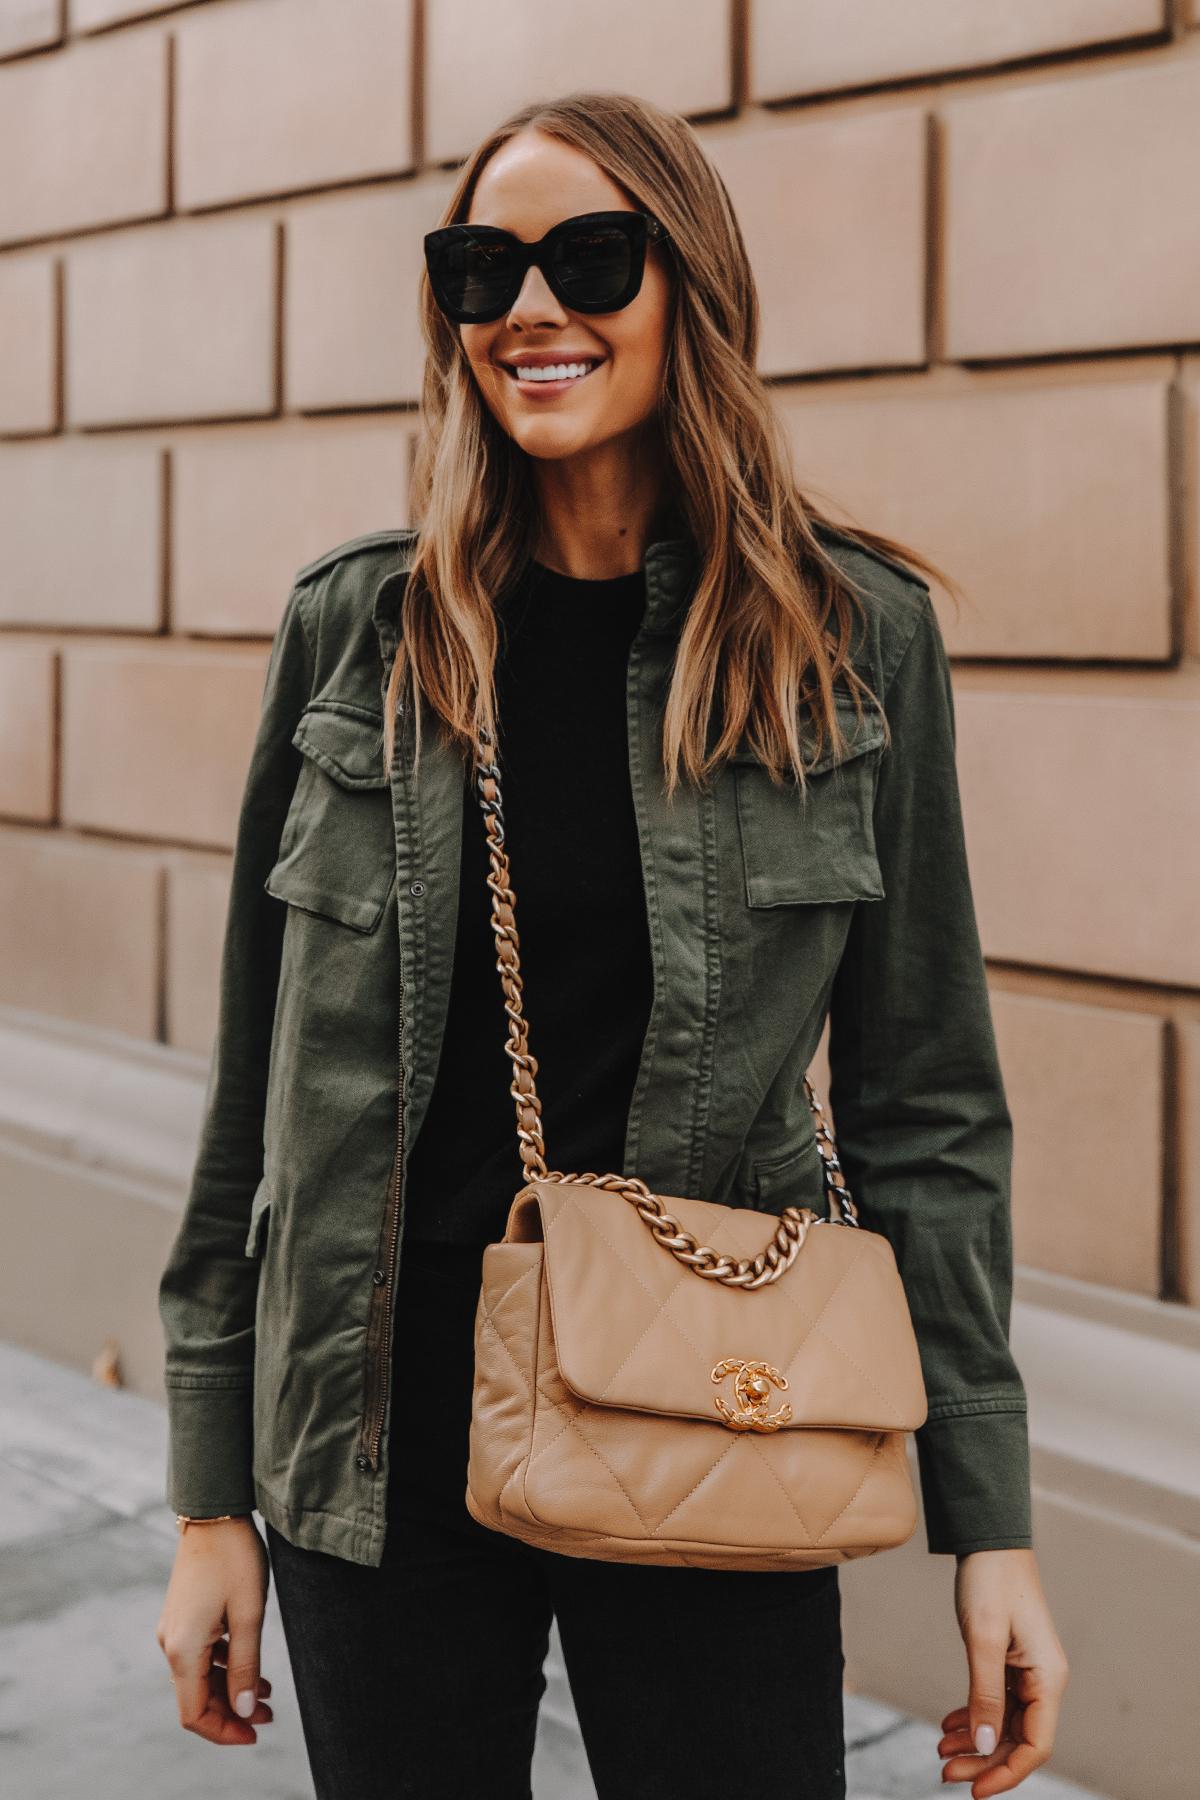 Fashion Jackson Wearing Anine Bing Green Utility Jacket Chanel 19 Small Dark Beige Handbag 1